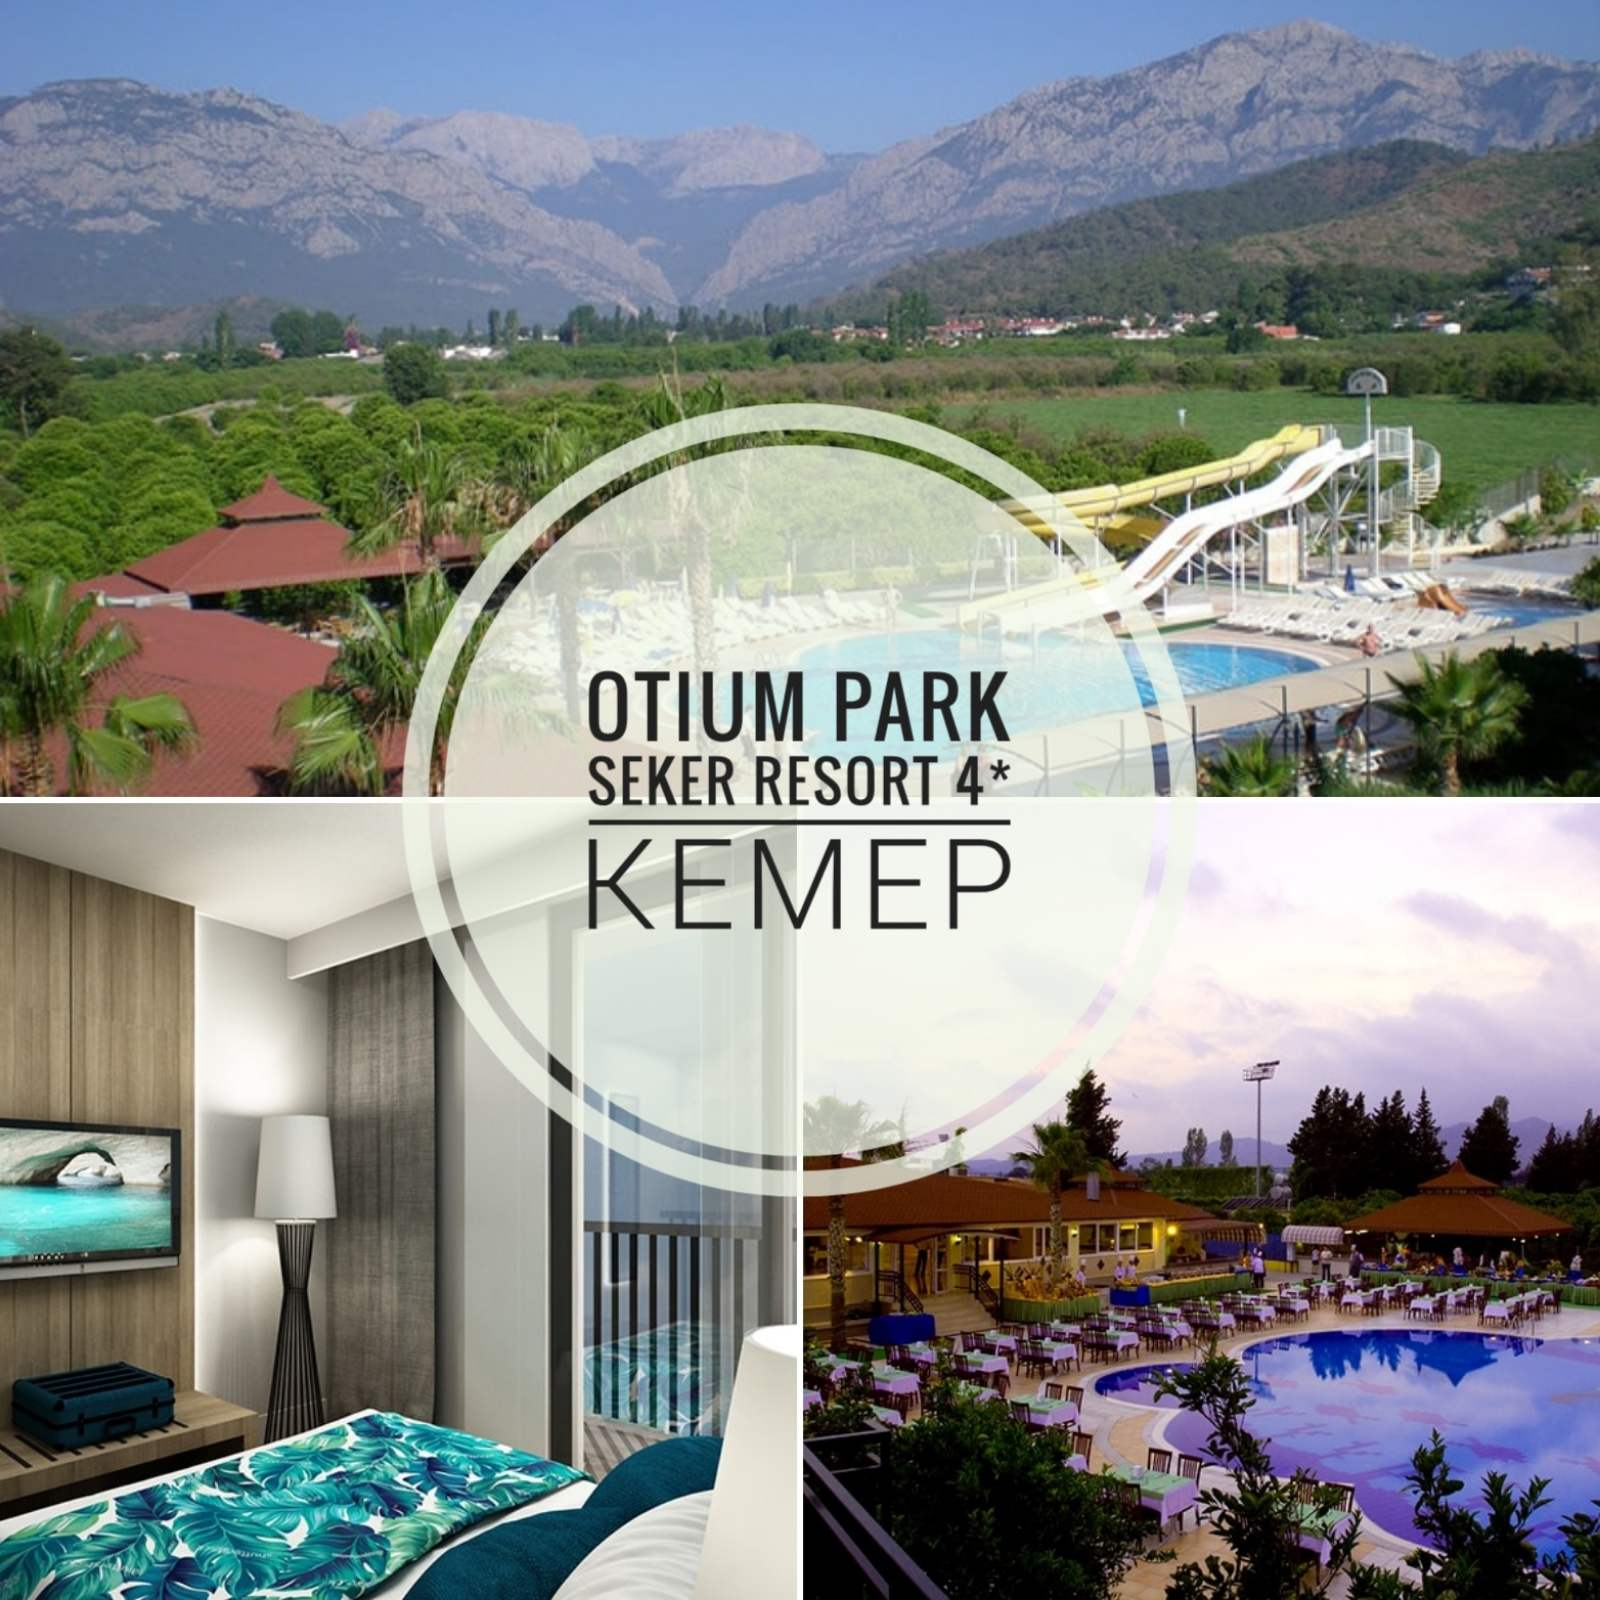 Otium Park Seker Resort 4